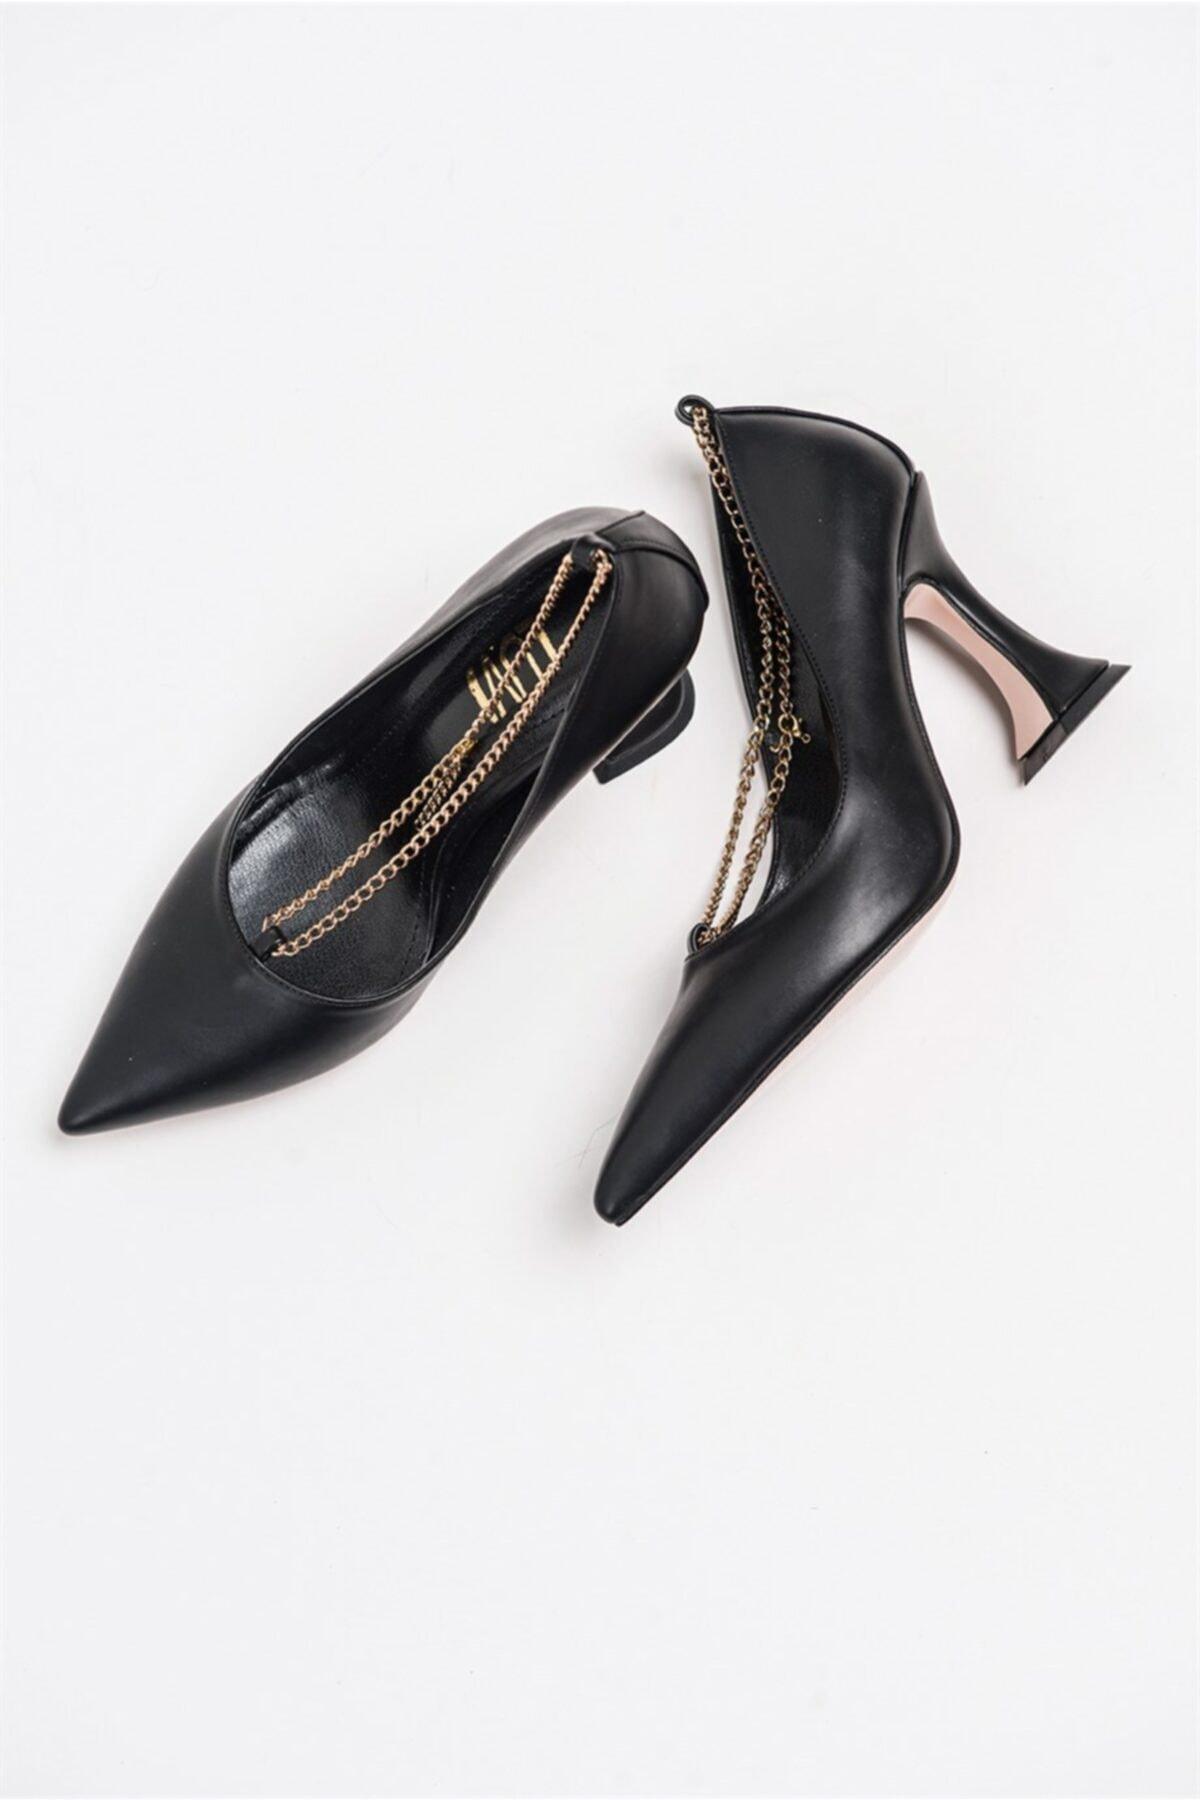 LuviShoes Kadın Siyah Cilt Topuklu Ayakkabı 8036809